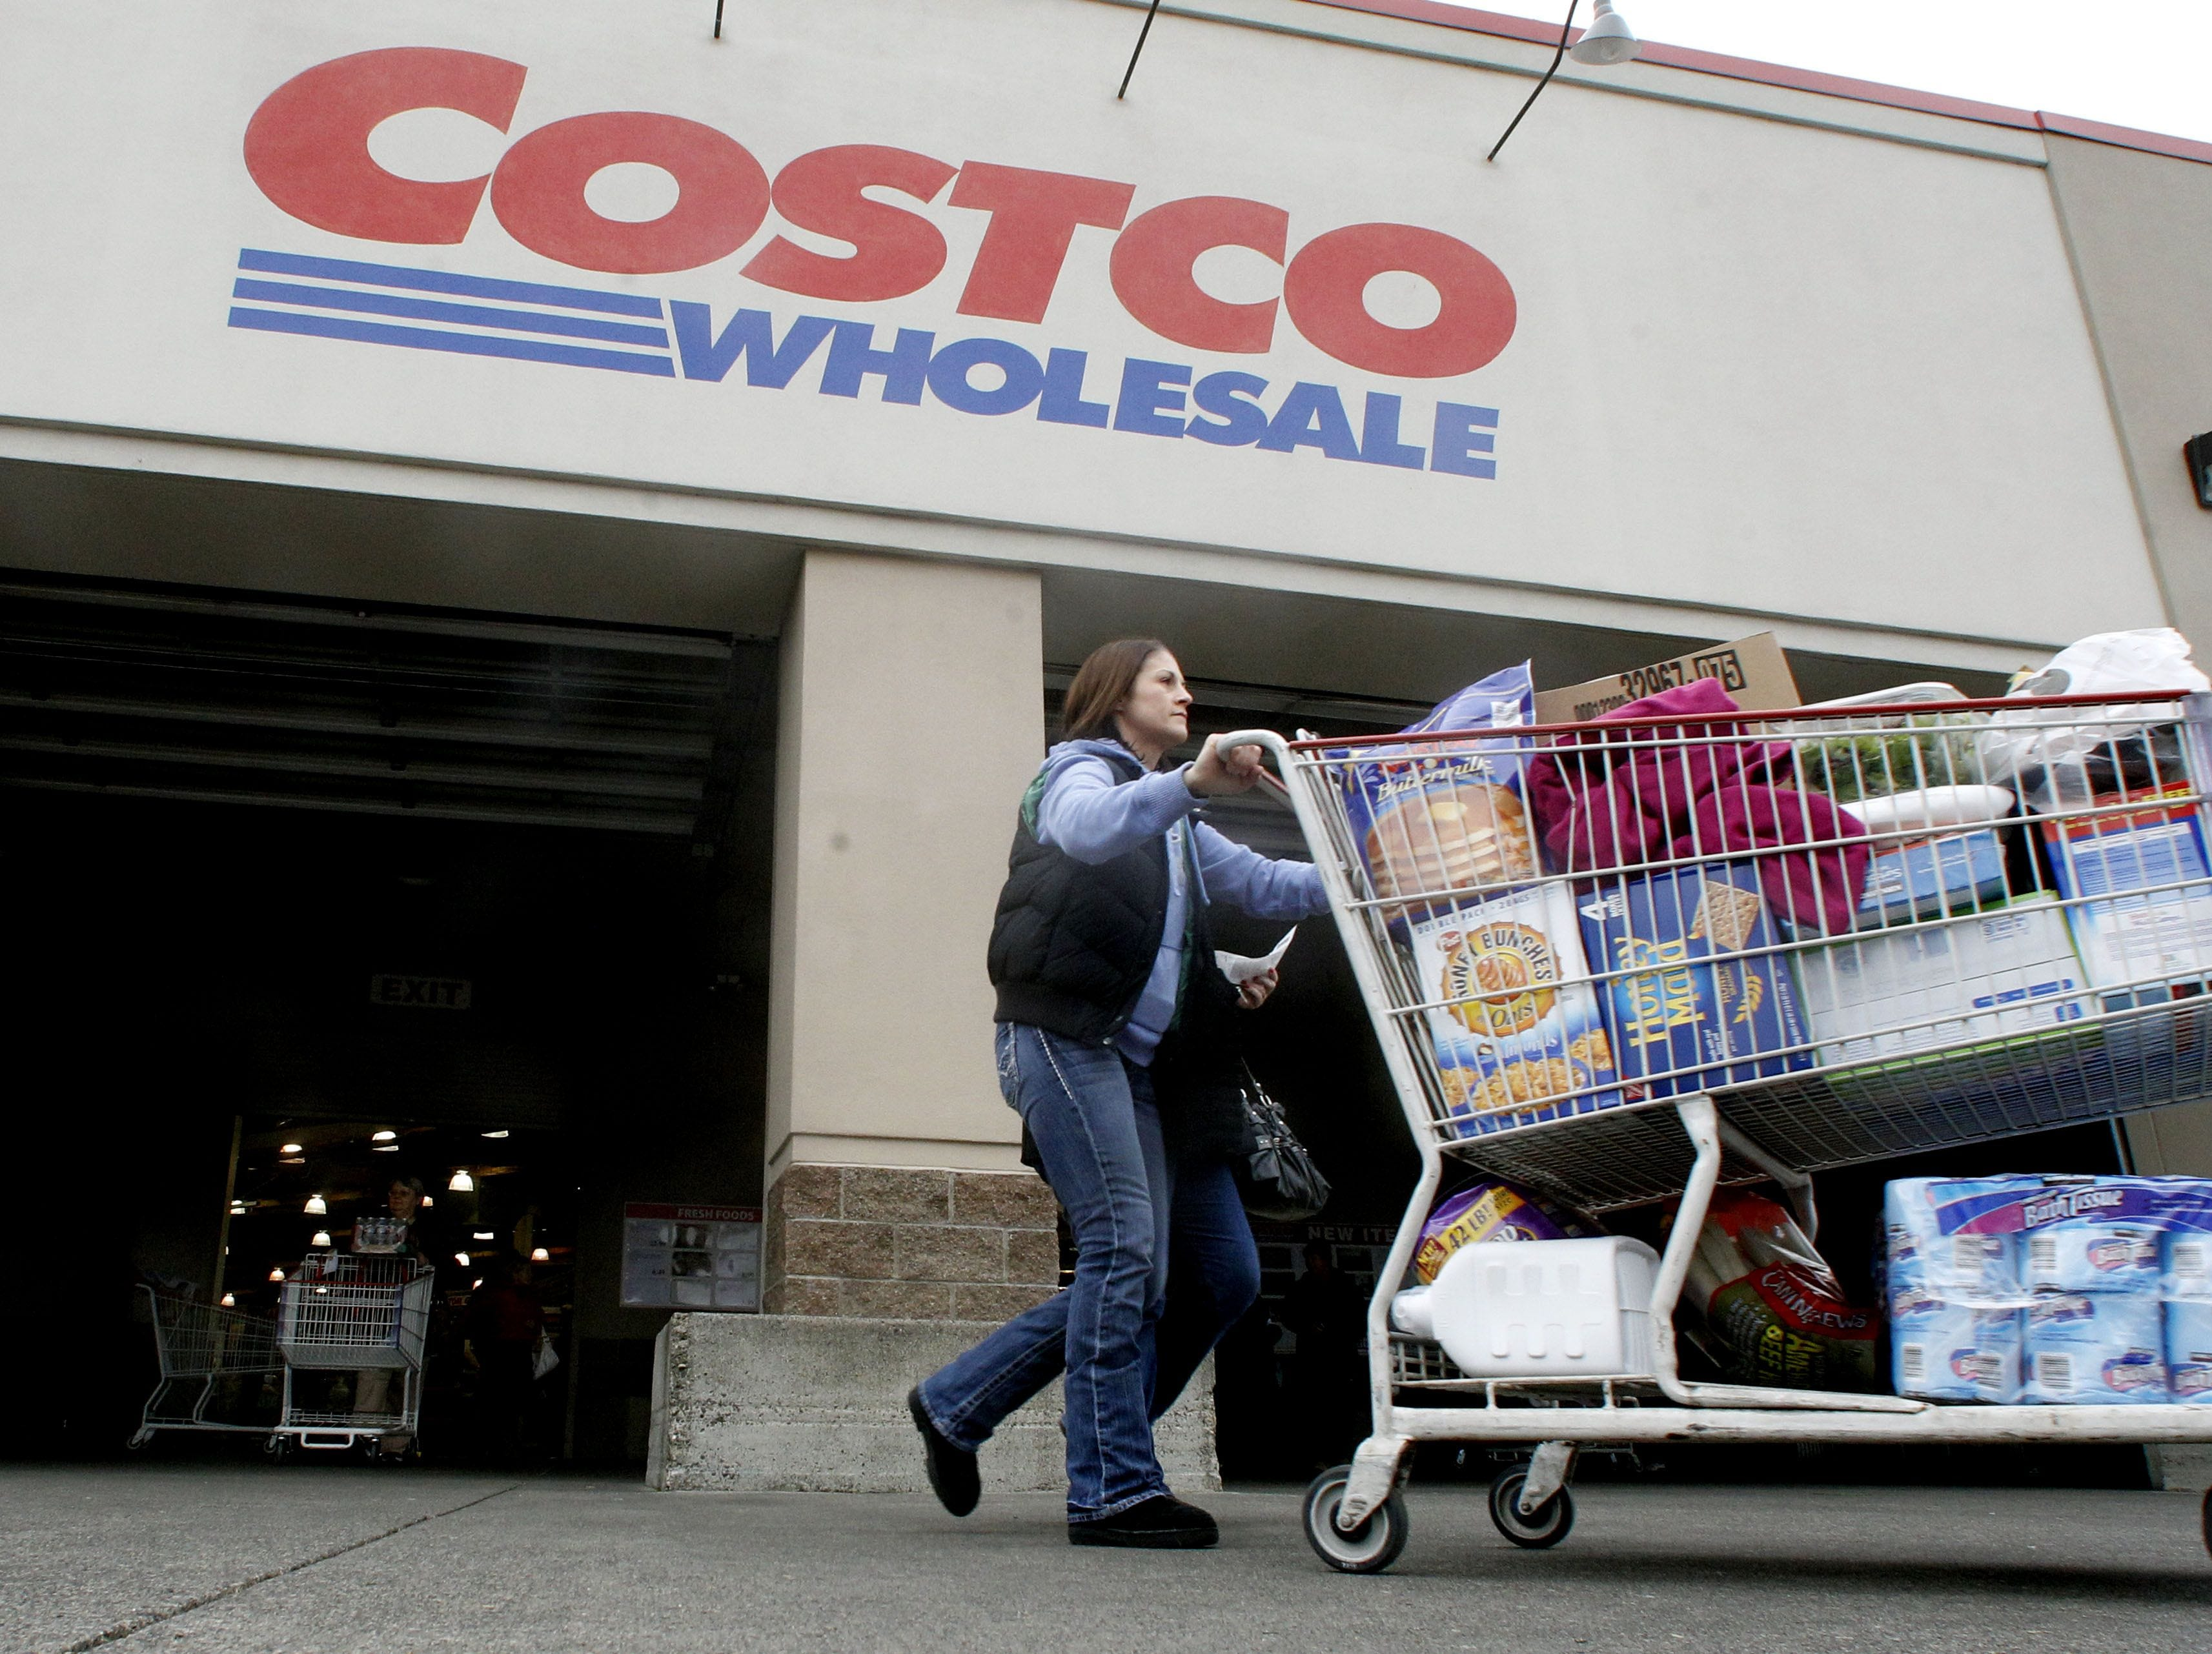 No. 29: Costco Wholesale  Corp. | Membership warehouse stores | 2019 employees: 5,569 | 2018 employees: 5,267 | Ownership: Public | Headquarters: Issaquah, Washington | www.costco.com